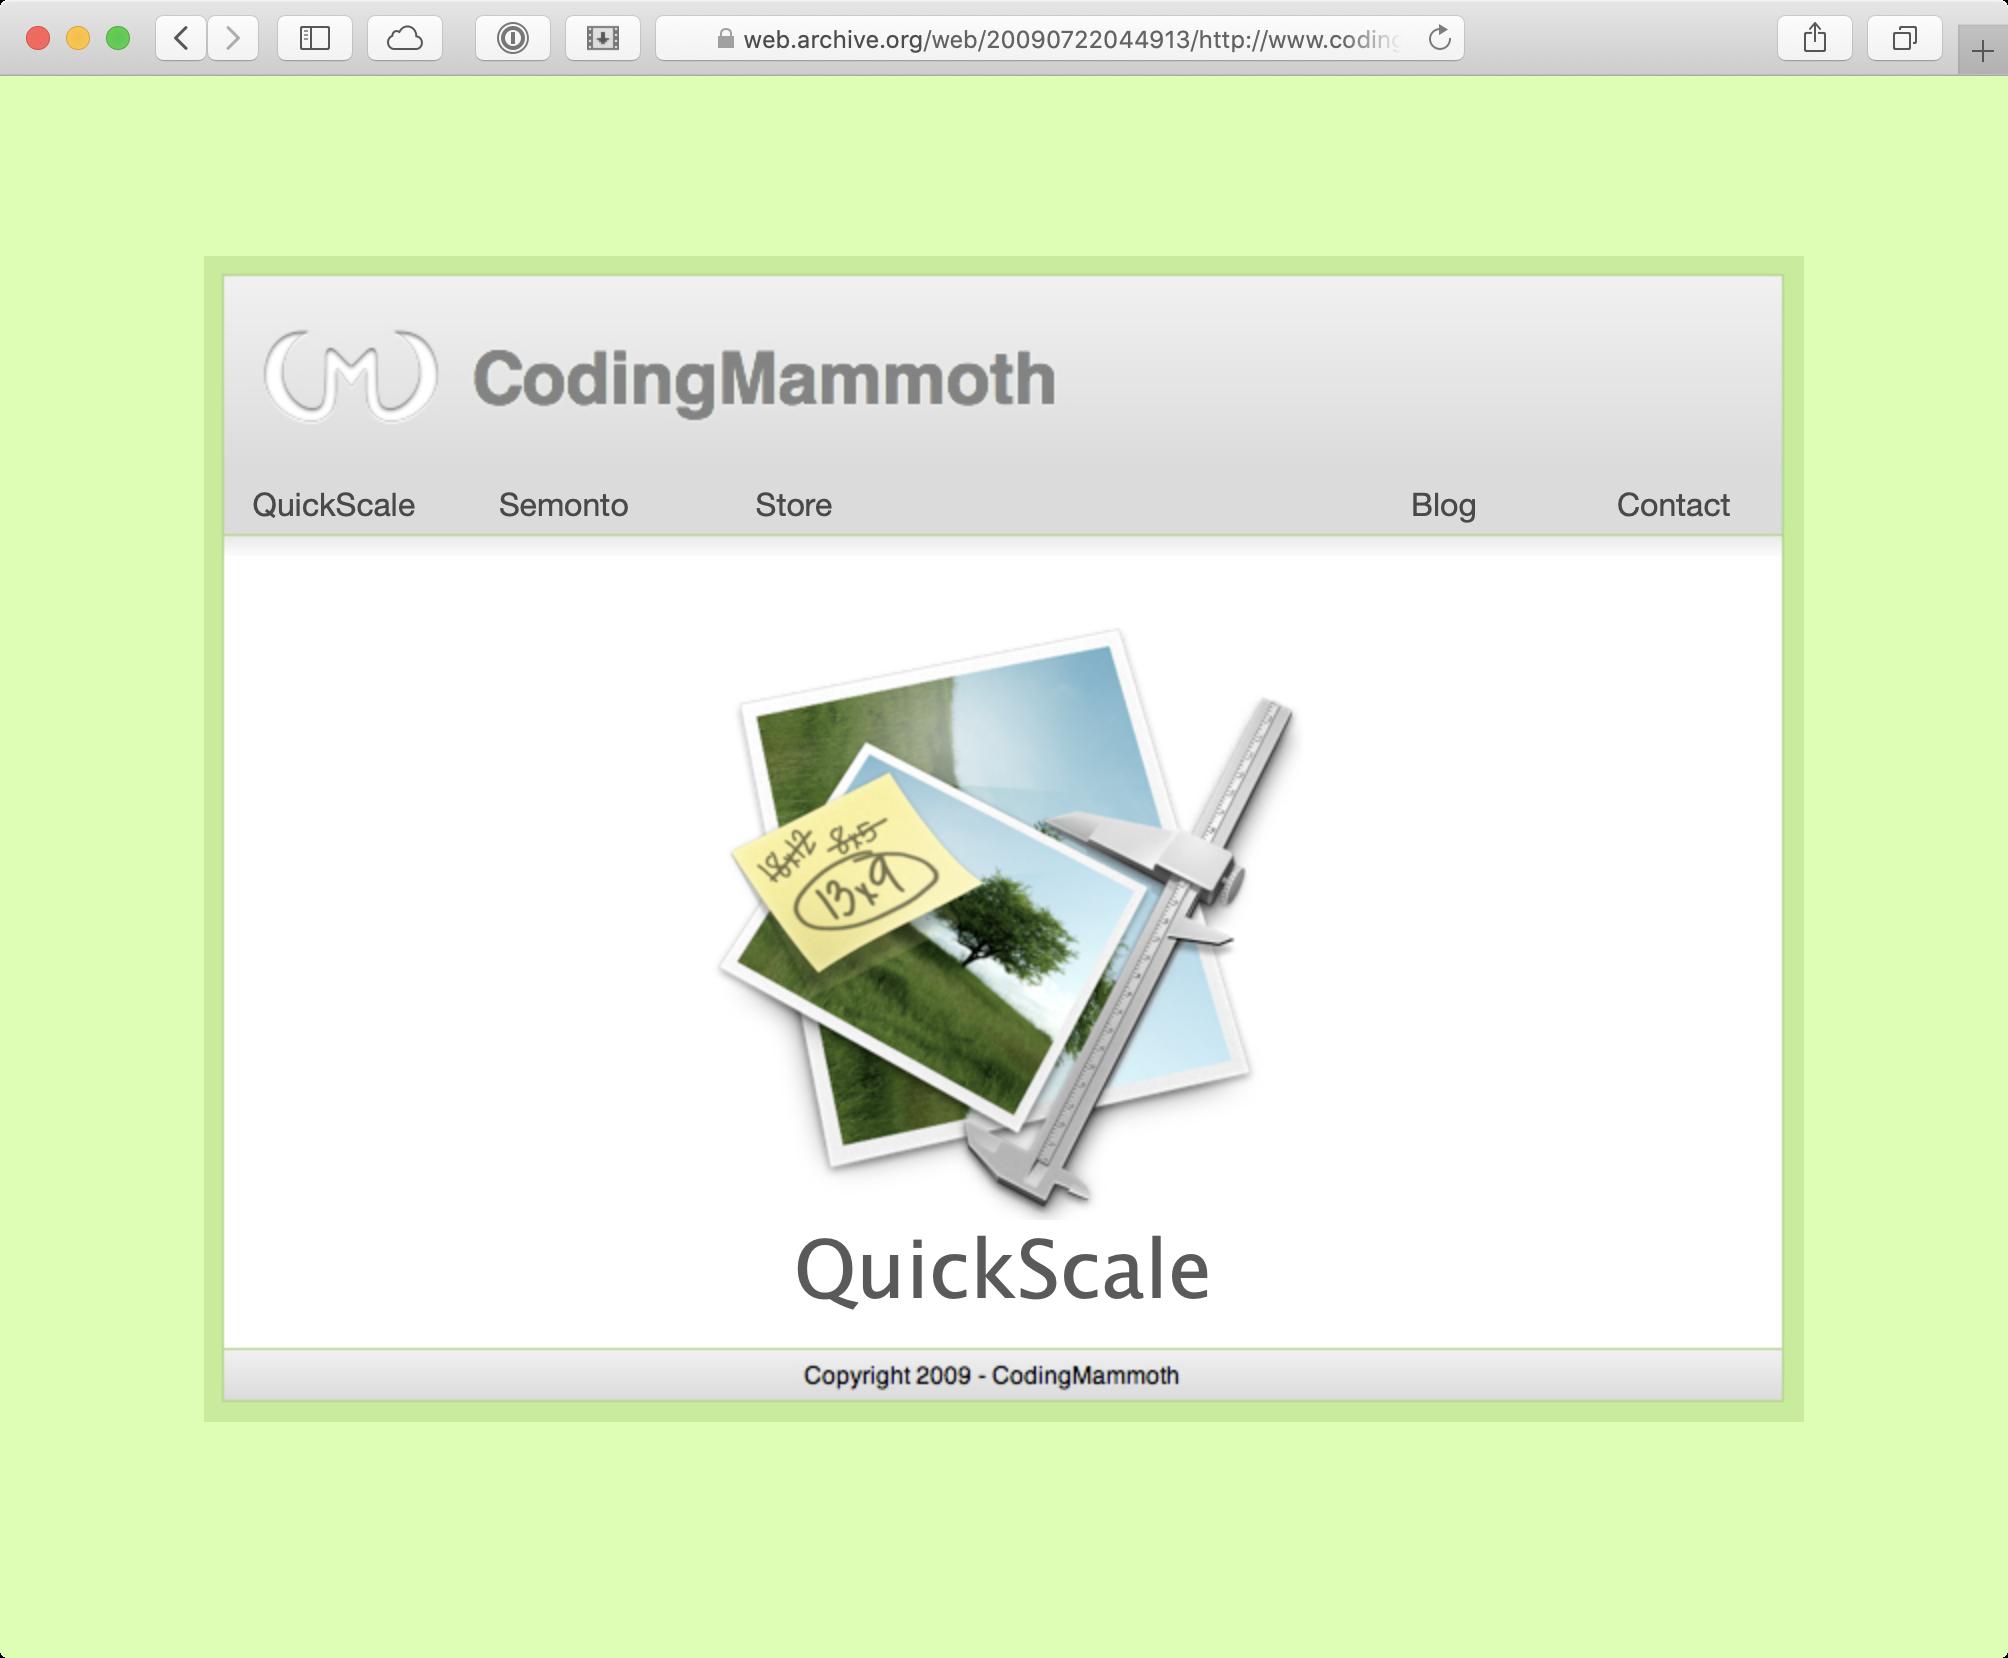 Website Coding Mammoth 2009